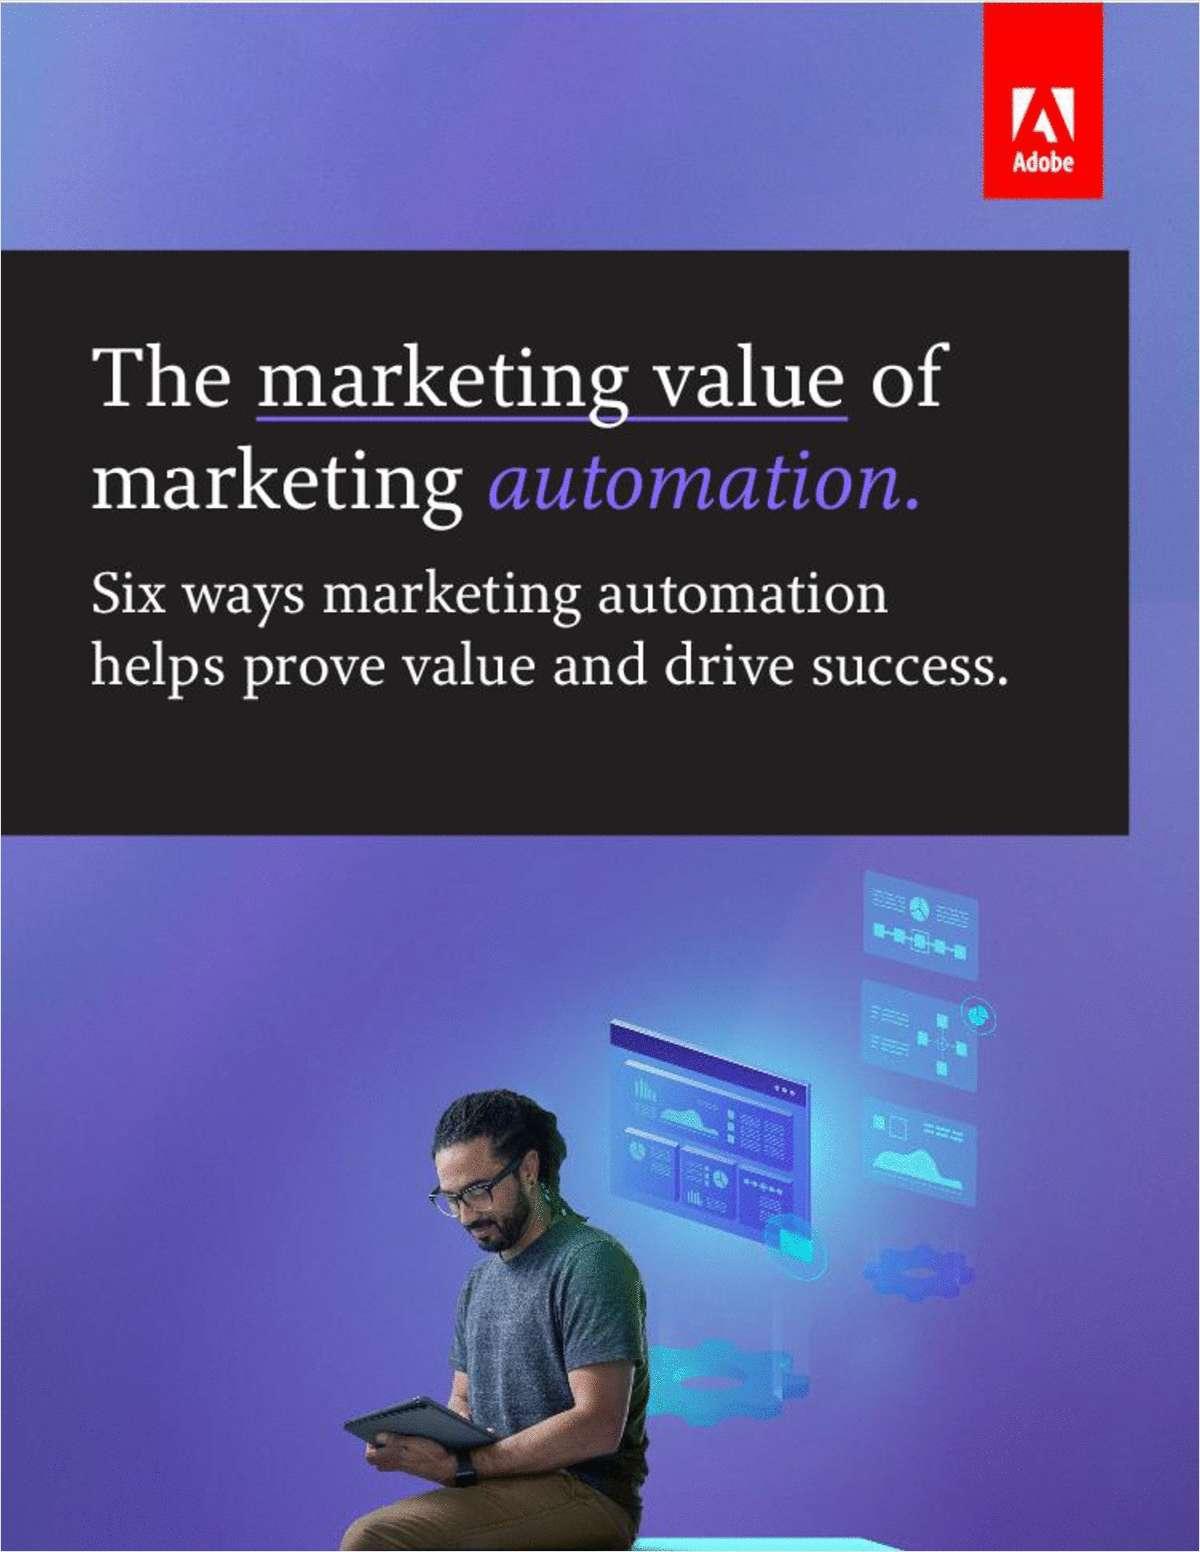 The Marketing Value of Marketing Automation